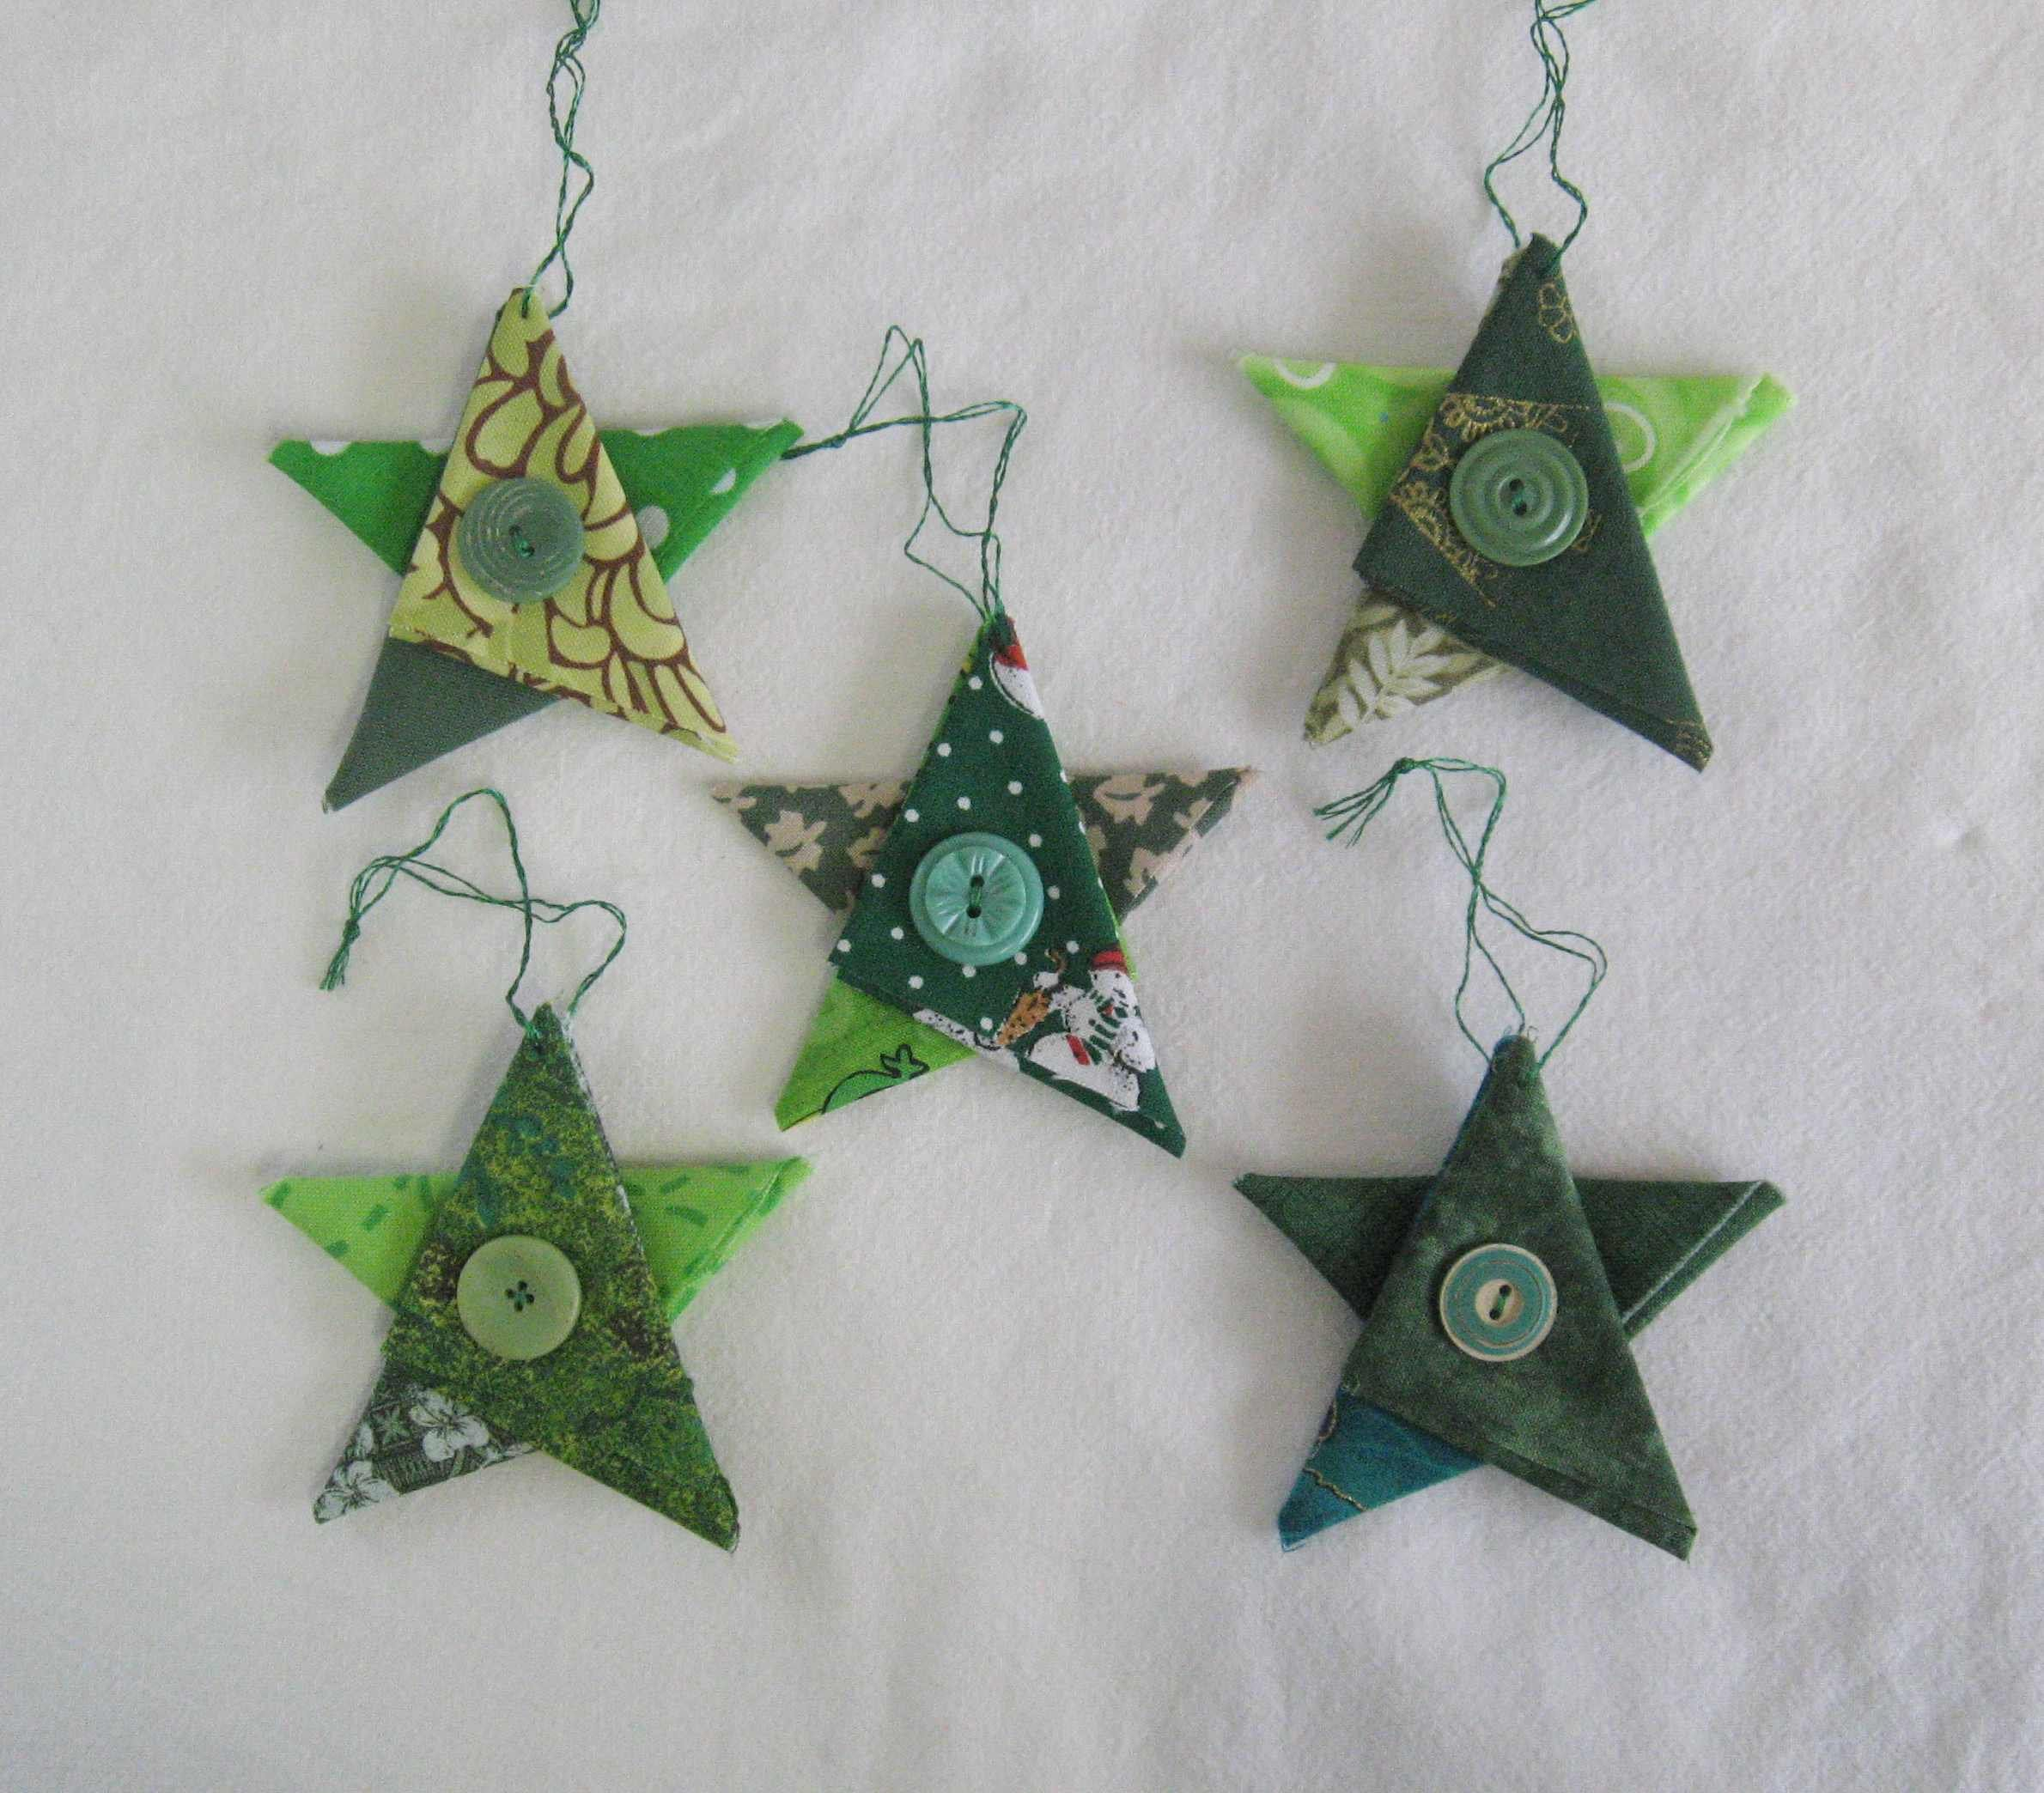 Green Star ornaments, Christmas ornaments, fabric star